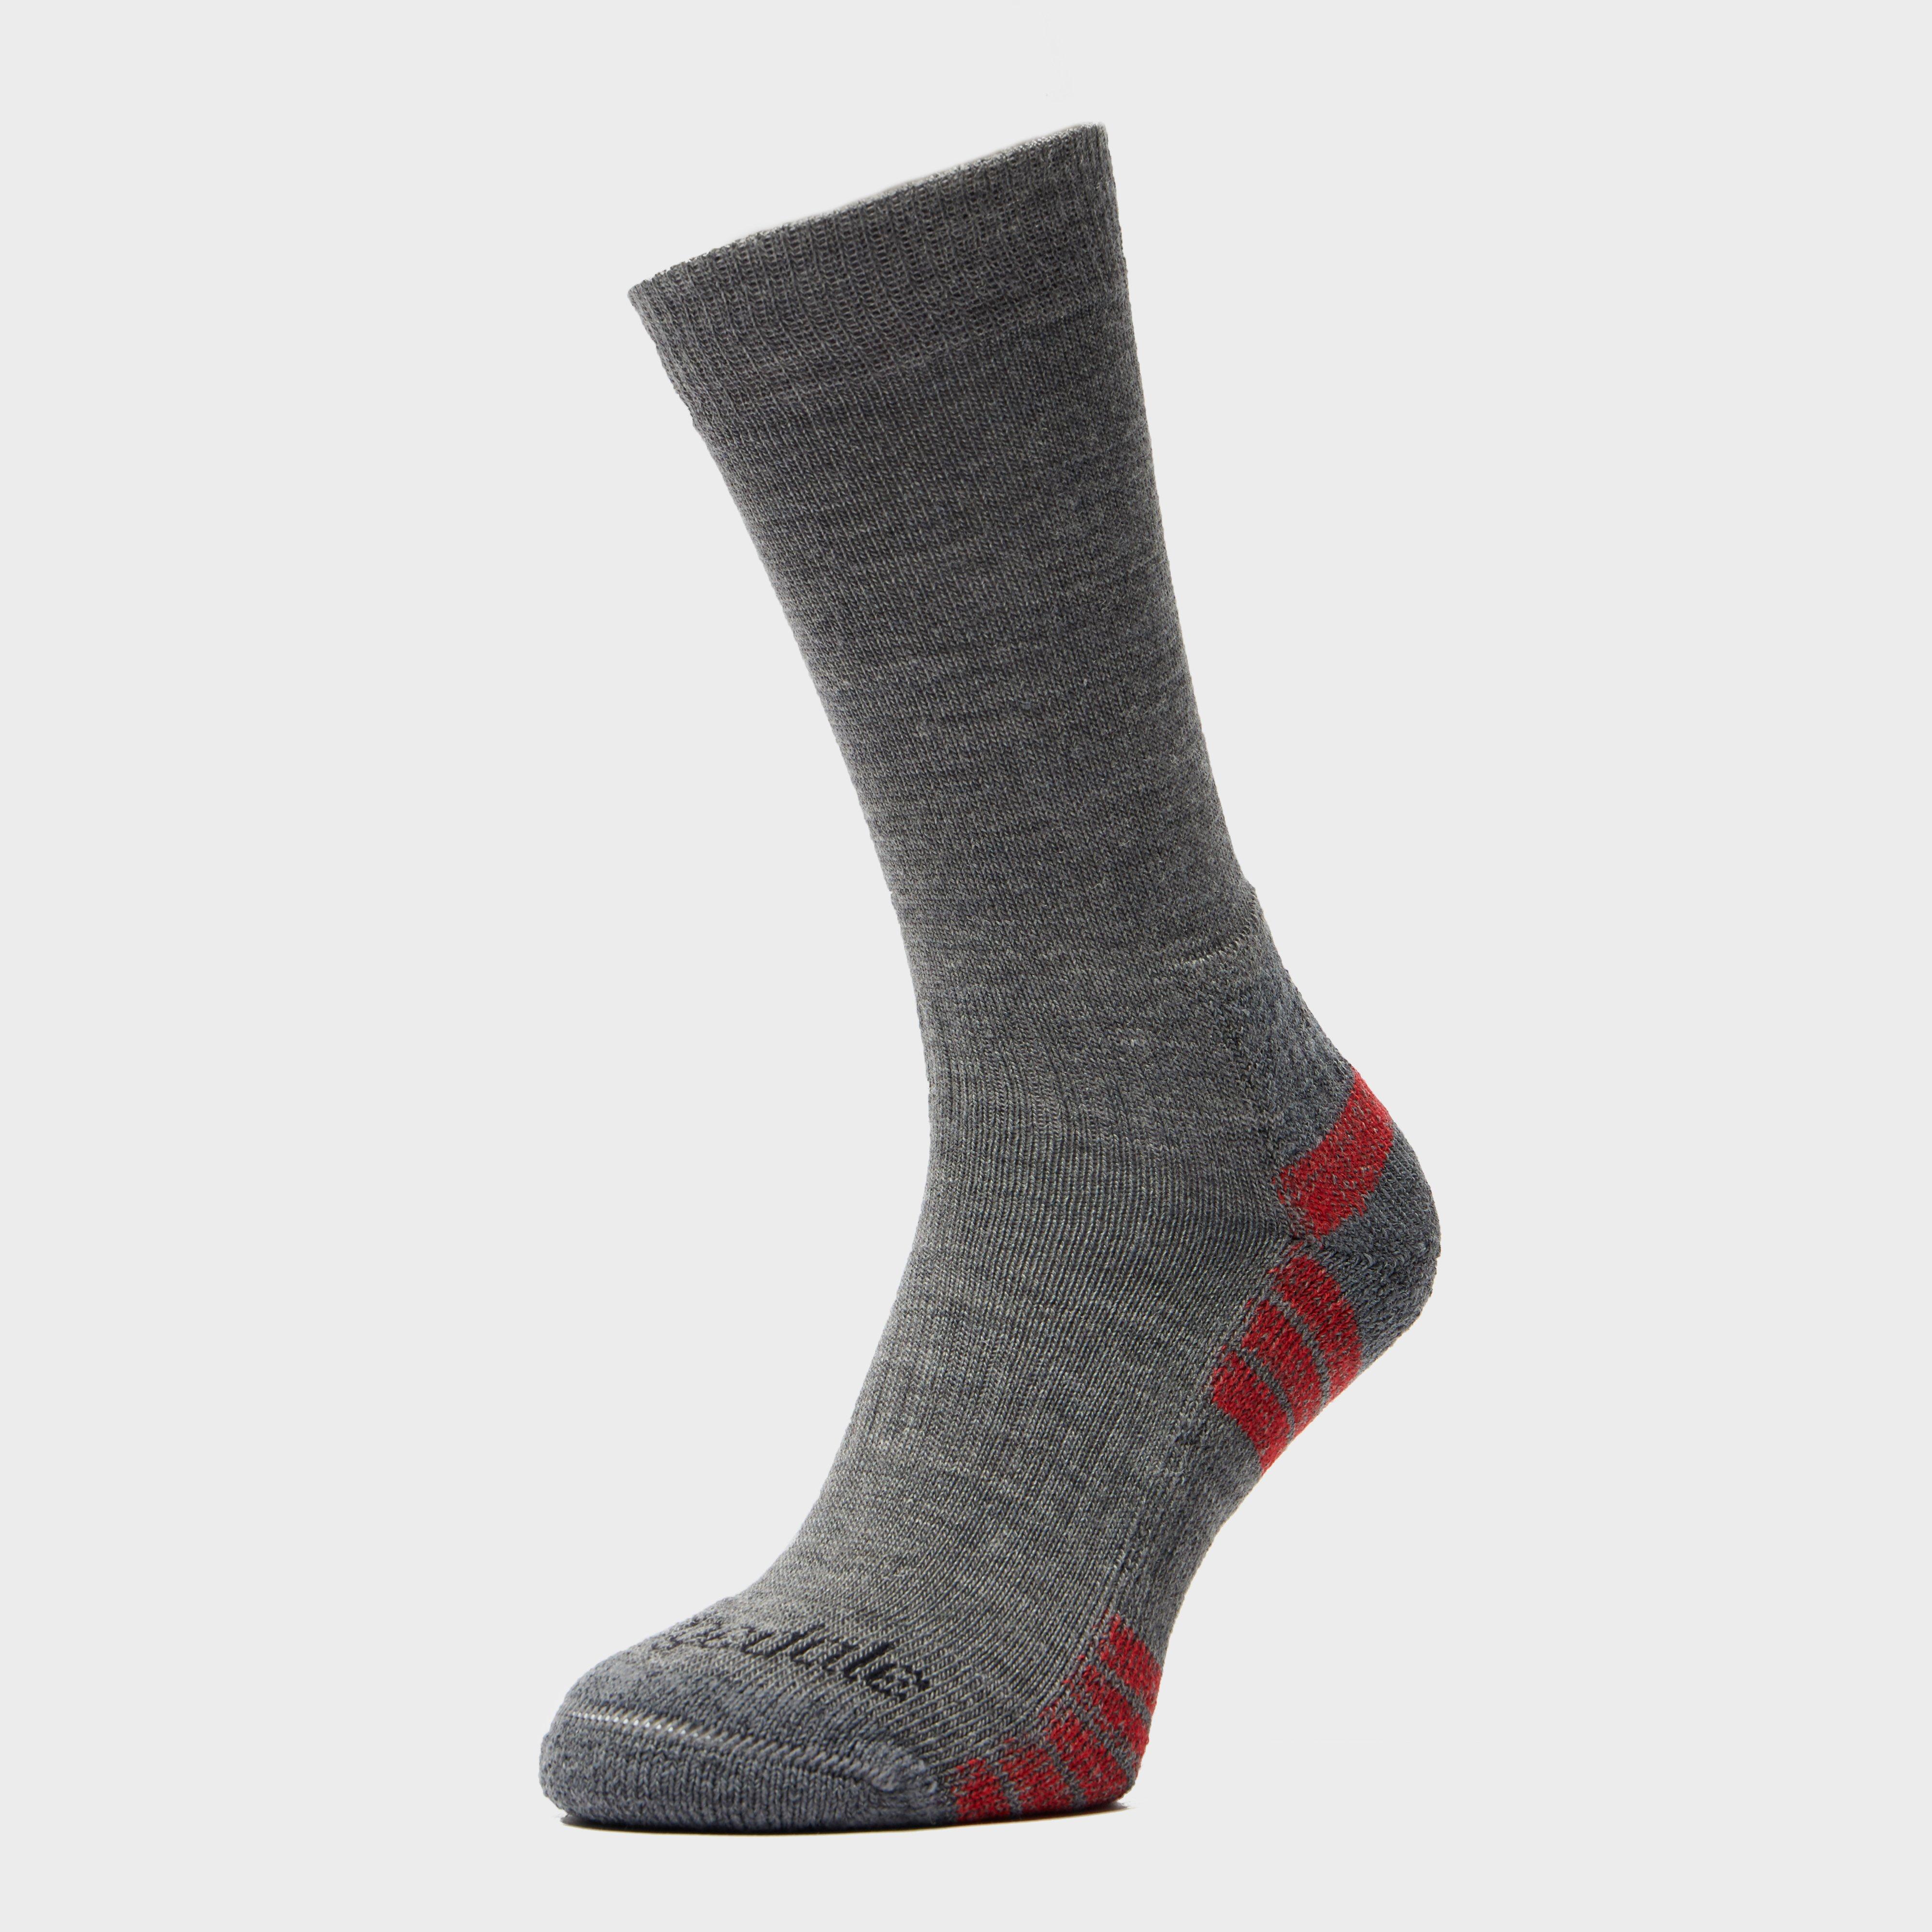 Bridgedale Bridgedale Mens HIKE Lightweight Merino Performance Socks - Grey, Grey